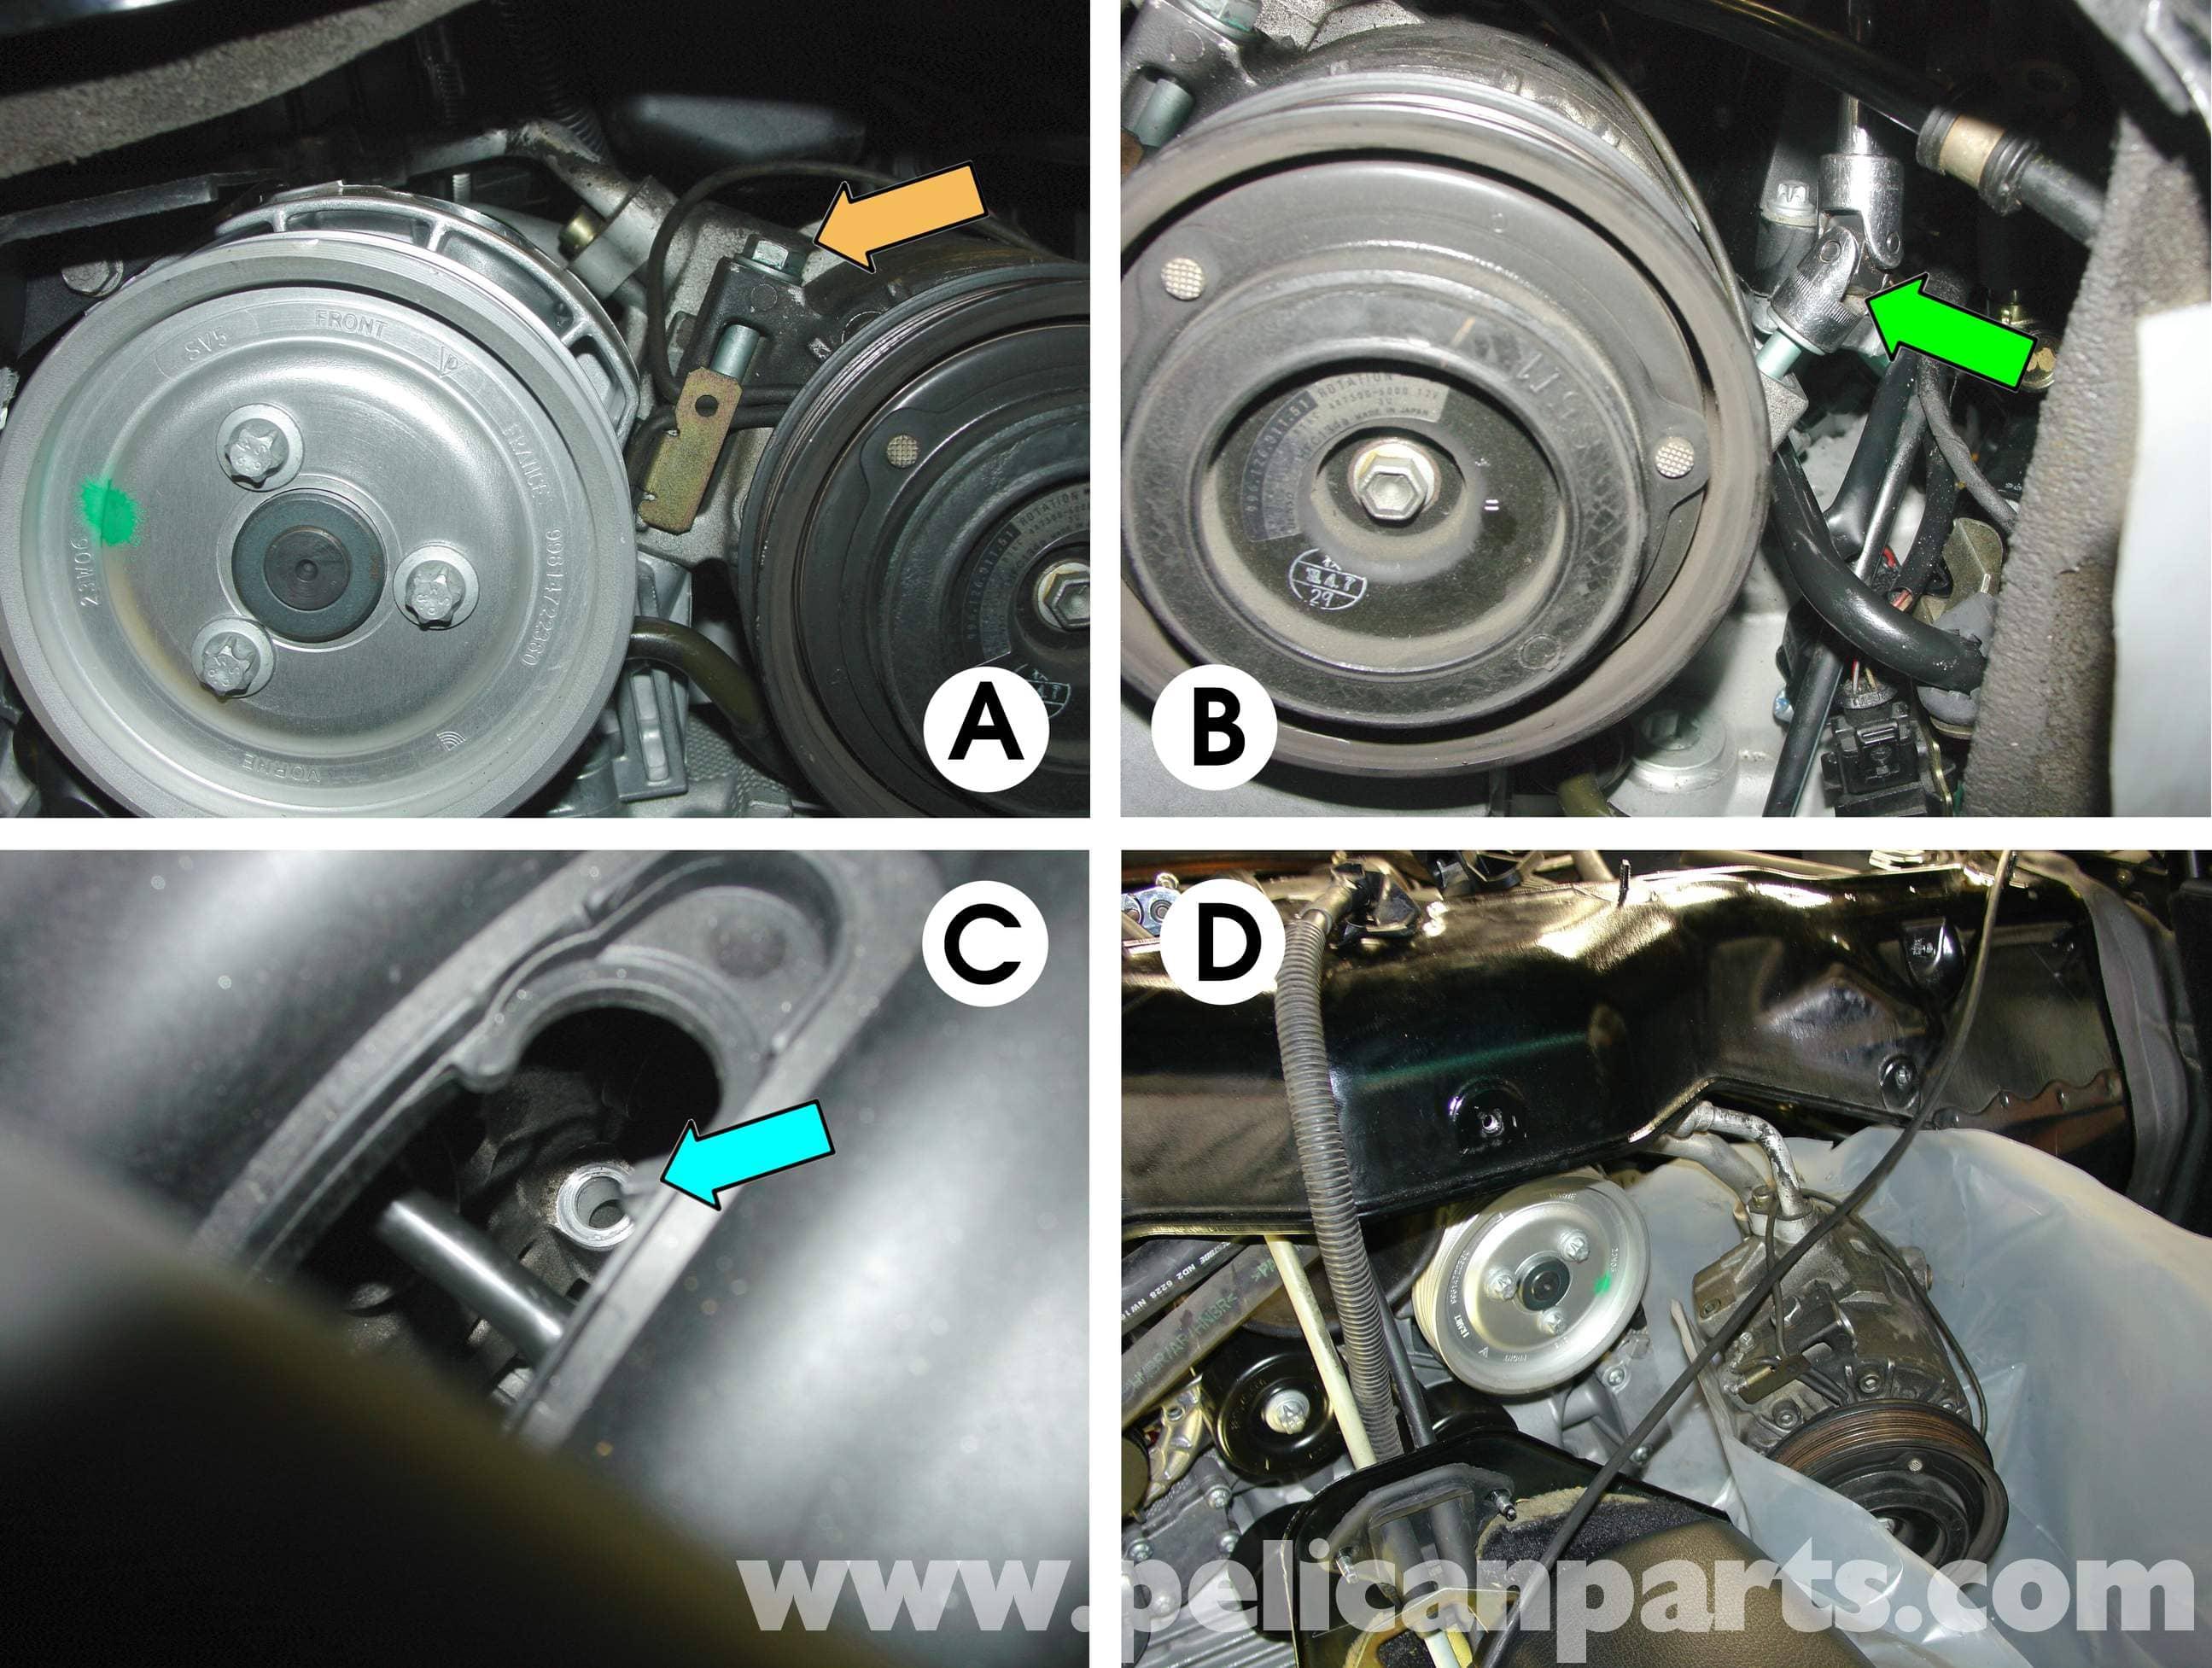 Porsche Boxster Engine Drop Removal 986 987 1997 08 Vacuum Diagram Large Image Extra